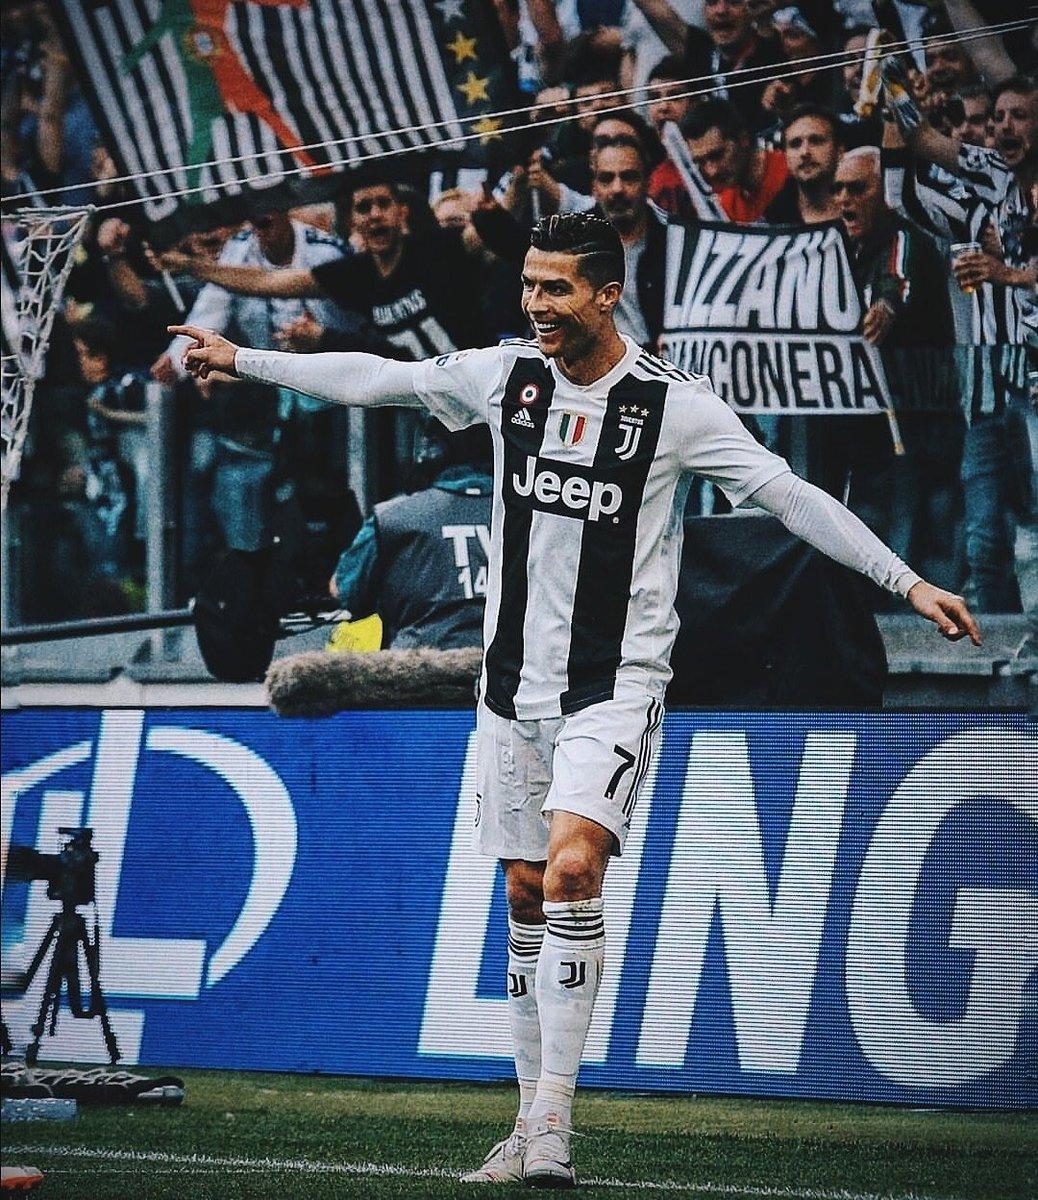 Motivaciones Fútbol's photo on La Juventus